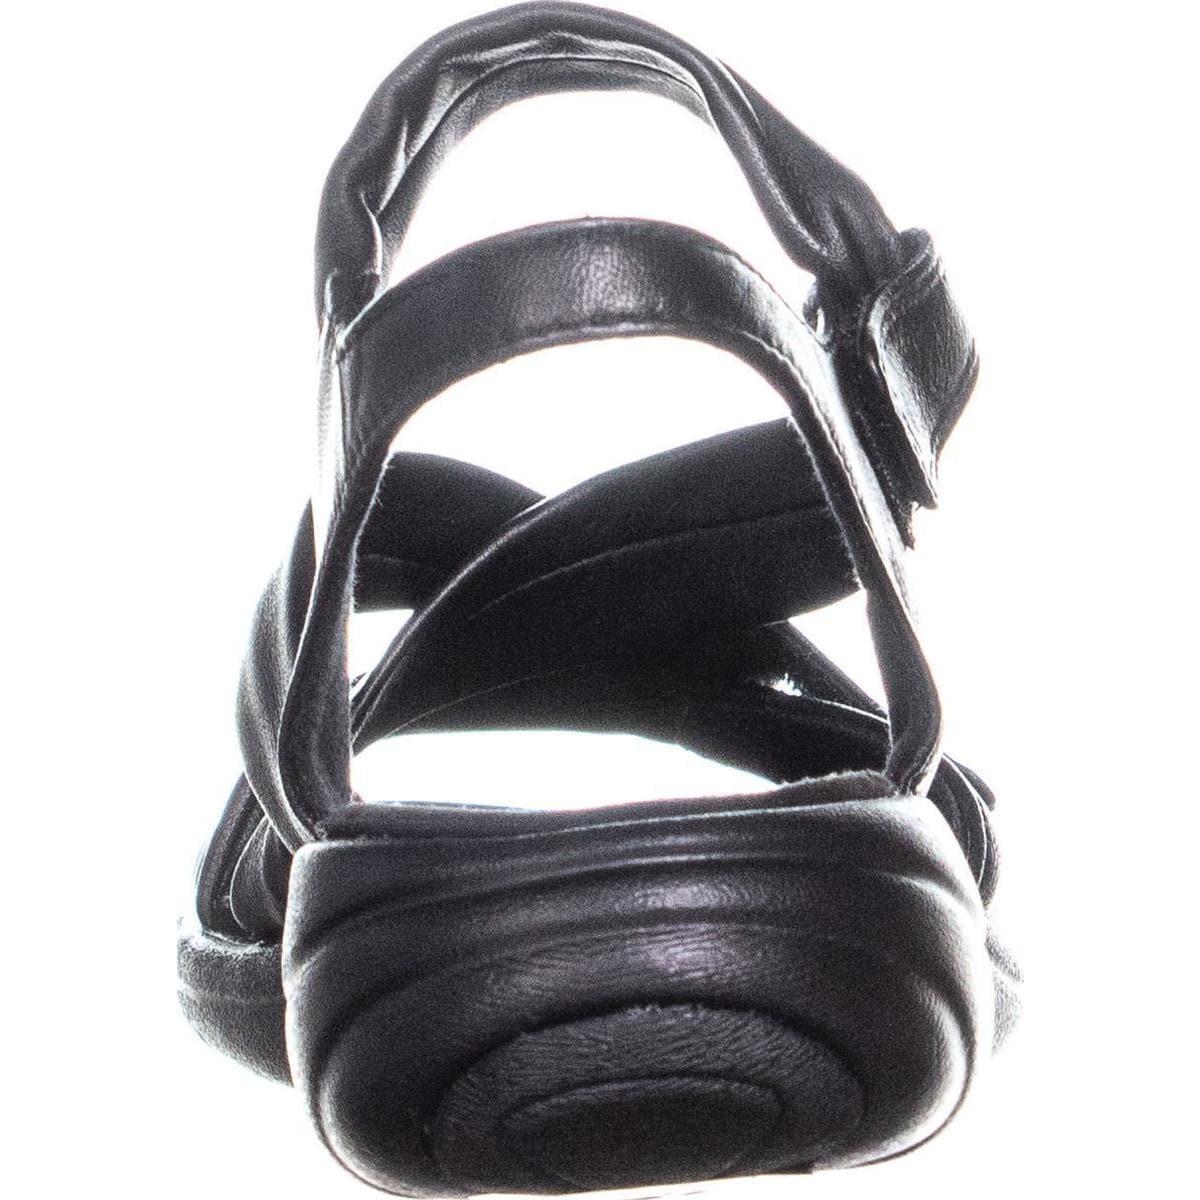 a657e394158c Shop Clarks Saylie Moon Criss Cross Sports Sandals